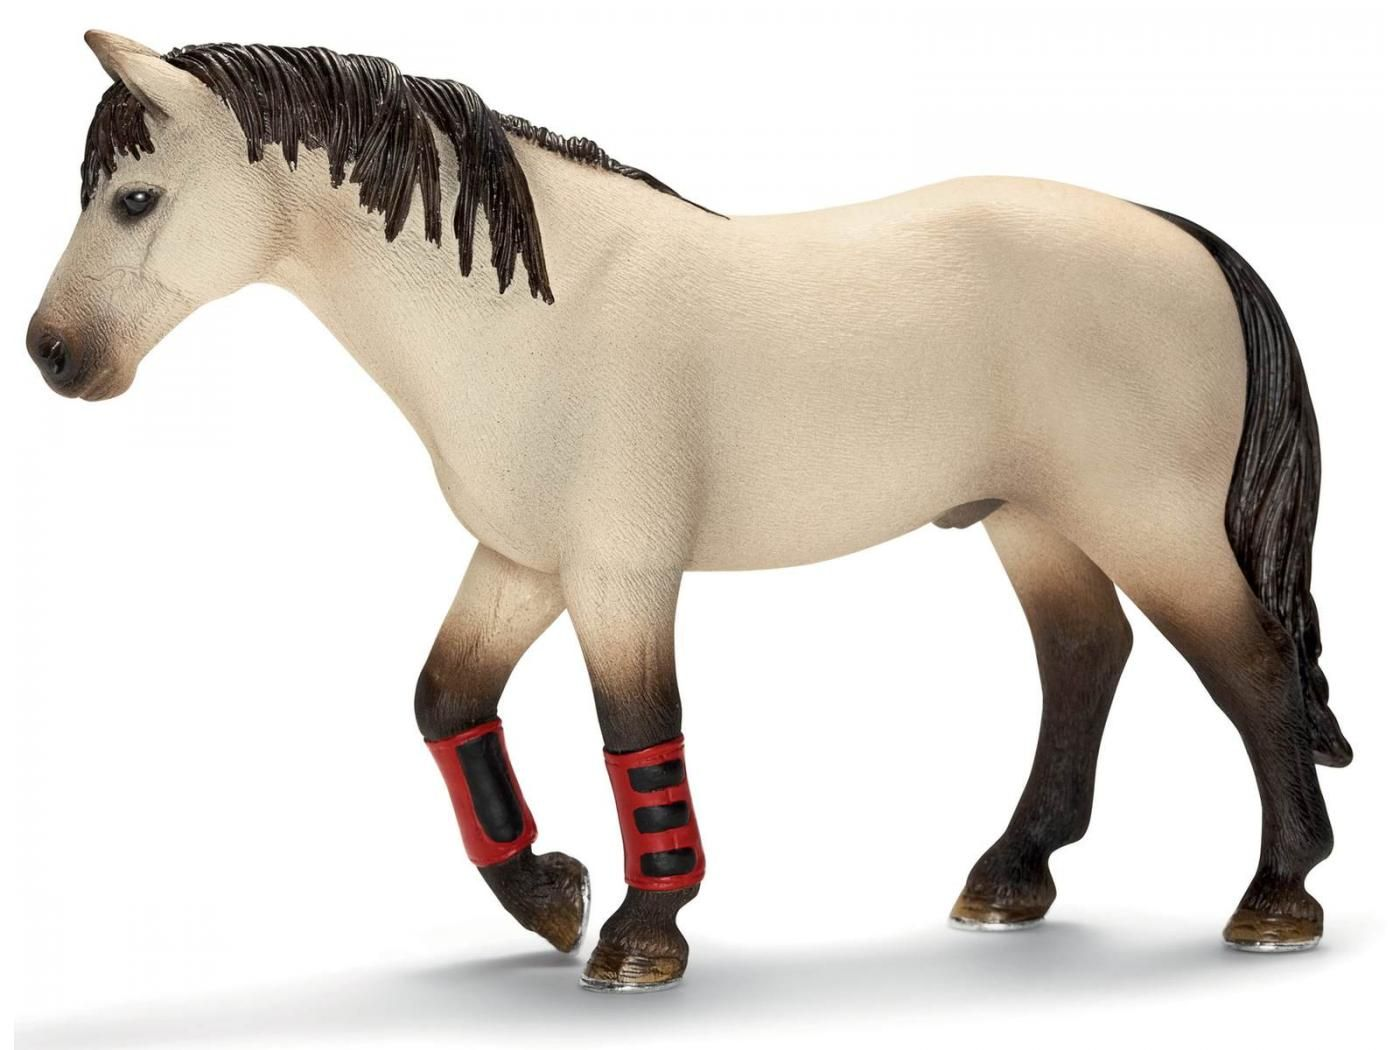 13855 Schleich anglaise pur-sang Mare Horse Club plastique Figure